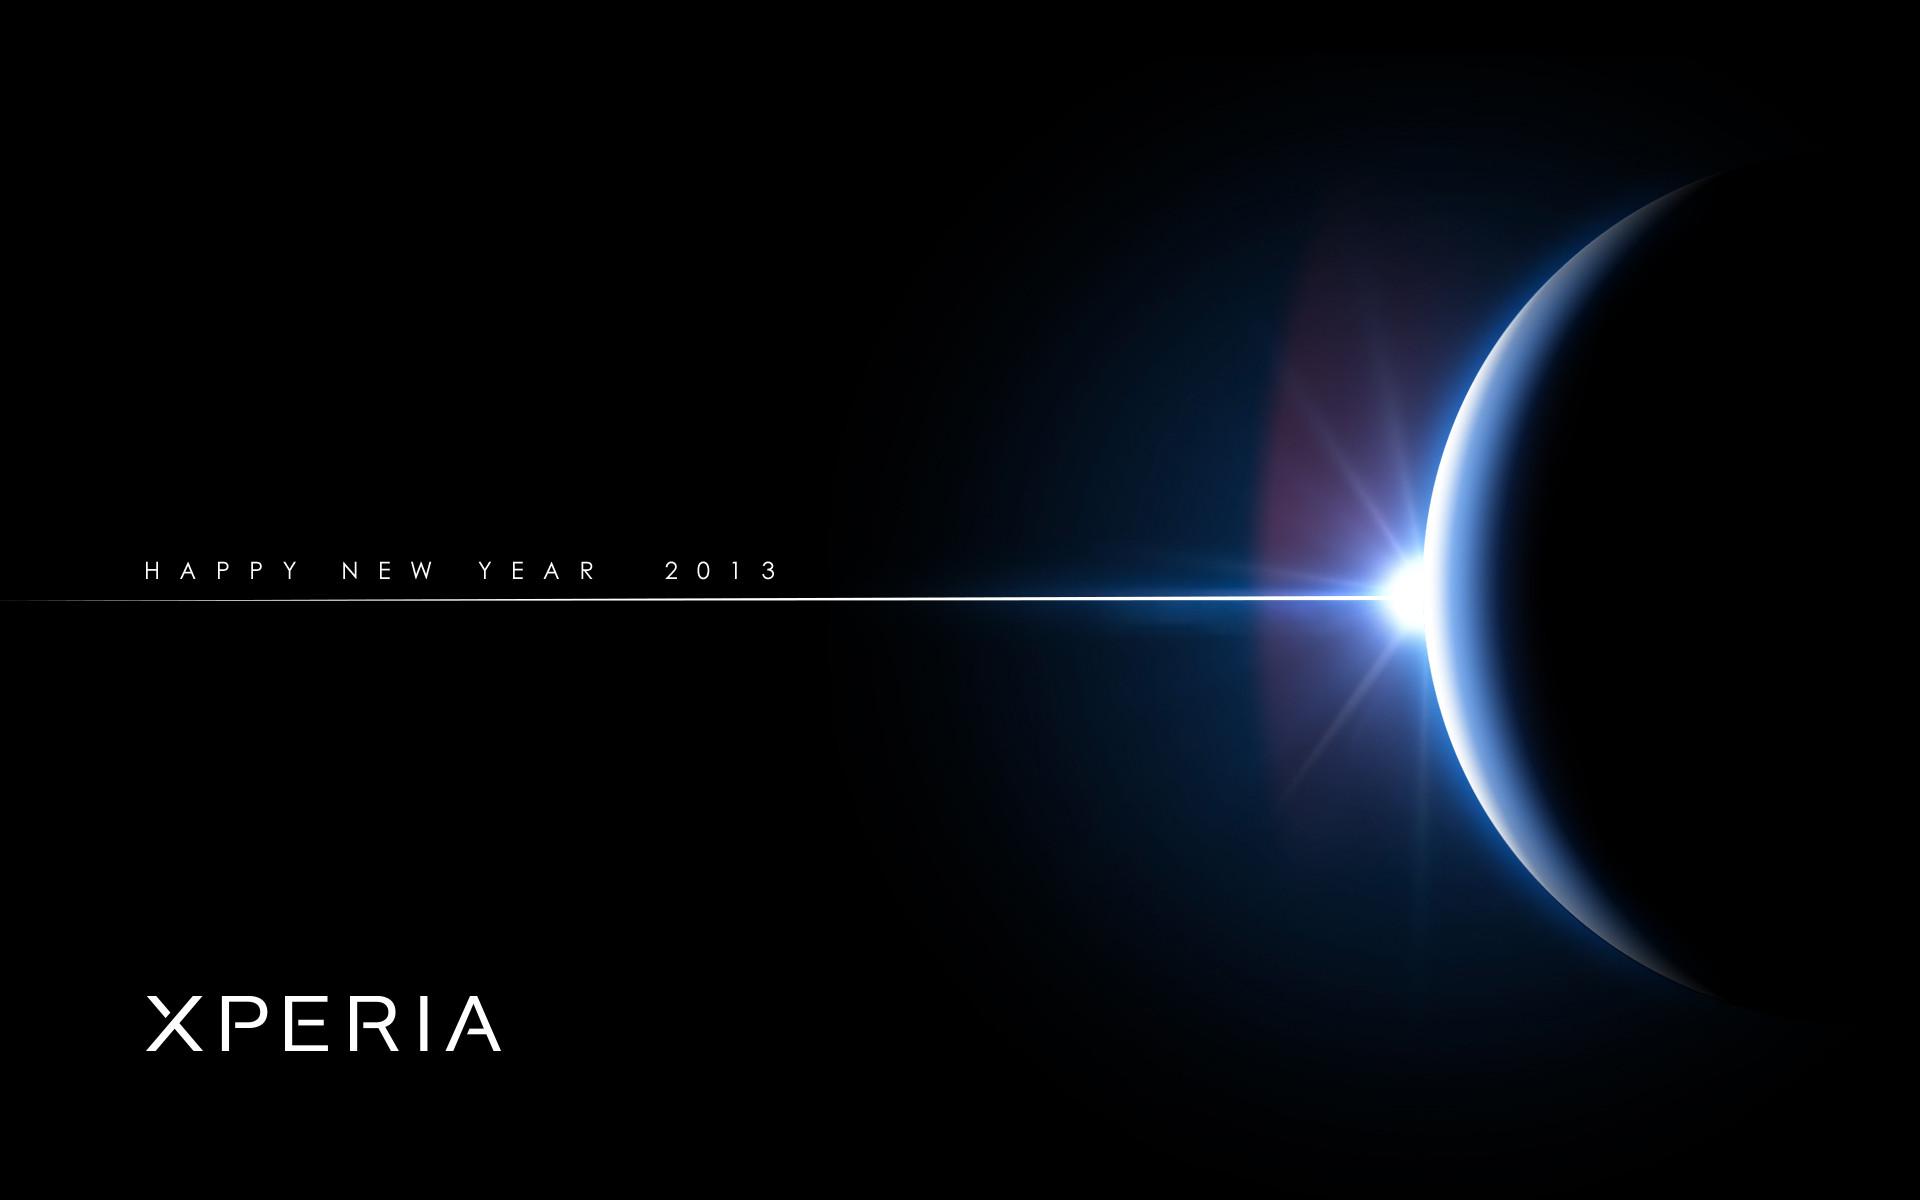 Wallpaper Hd Sony Xperia Eclipse 293040 Hd Wallpaper